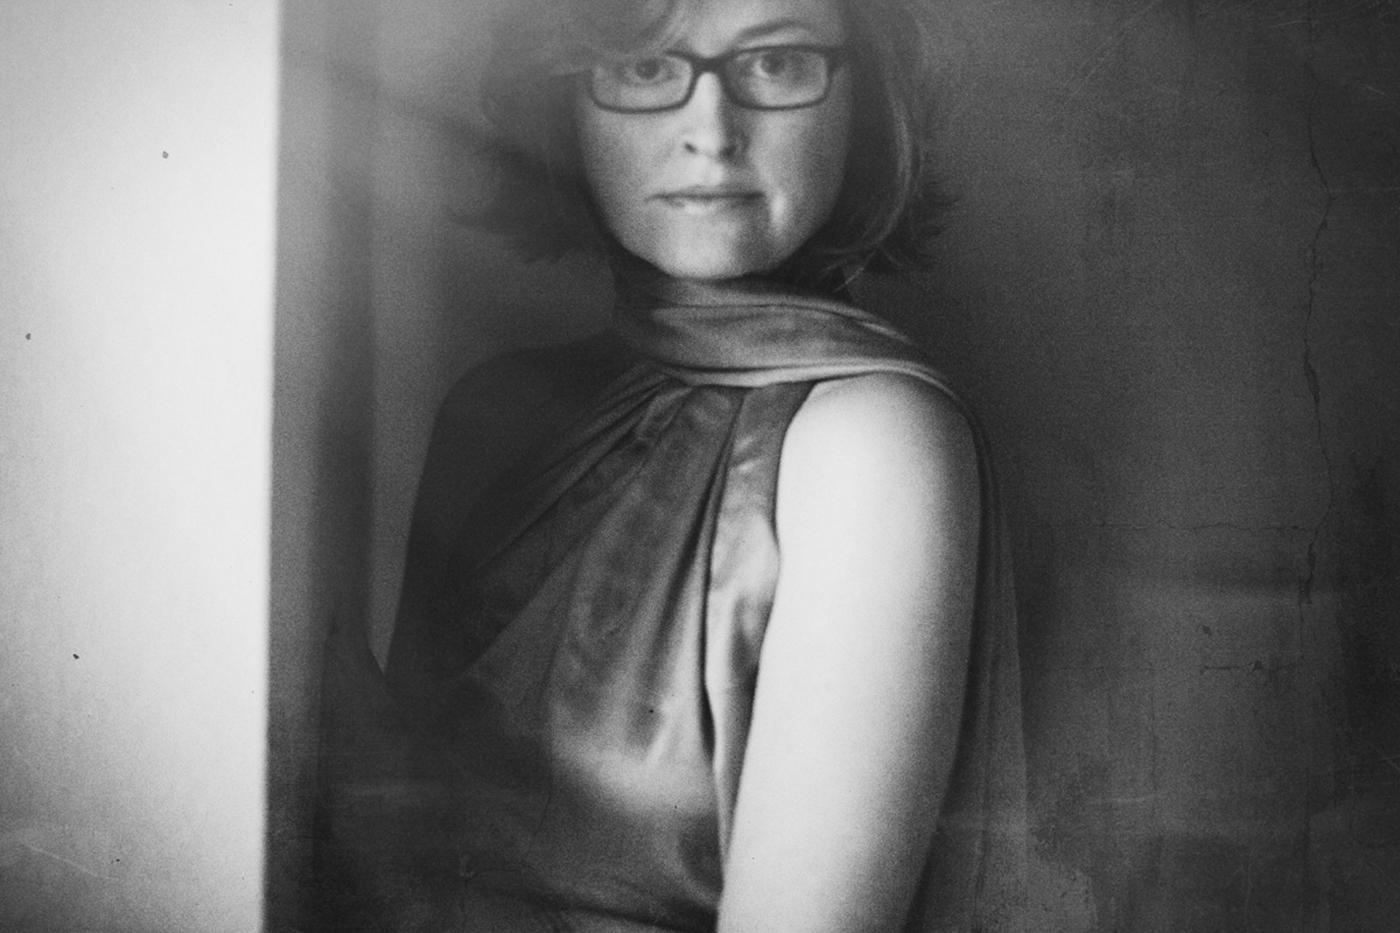 JennKL_Self Portrait_Black and White_web.jpg